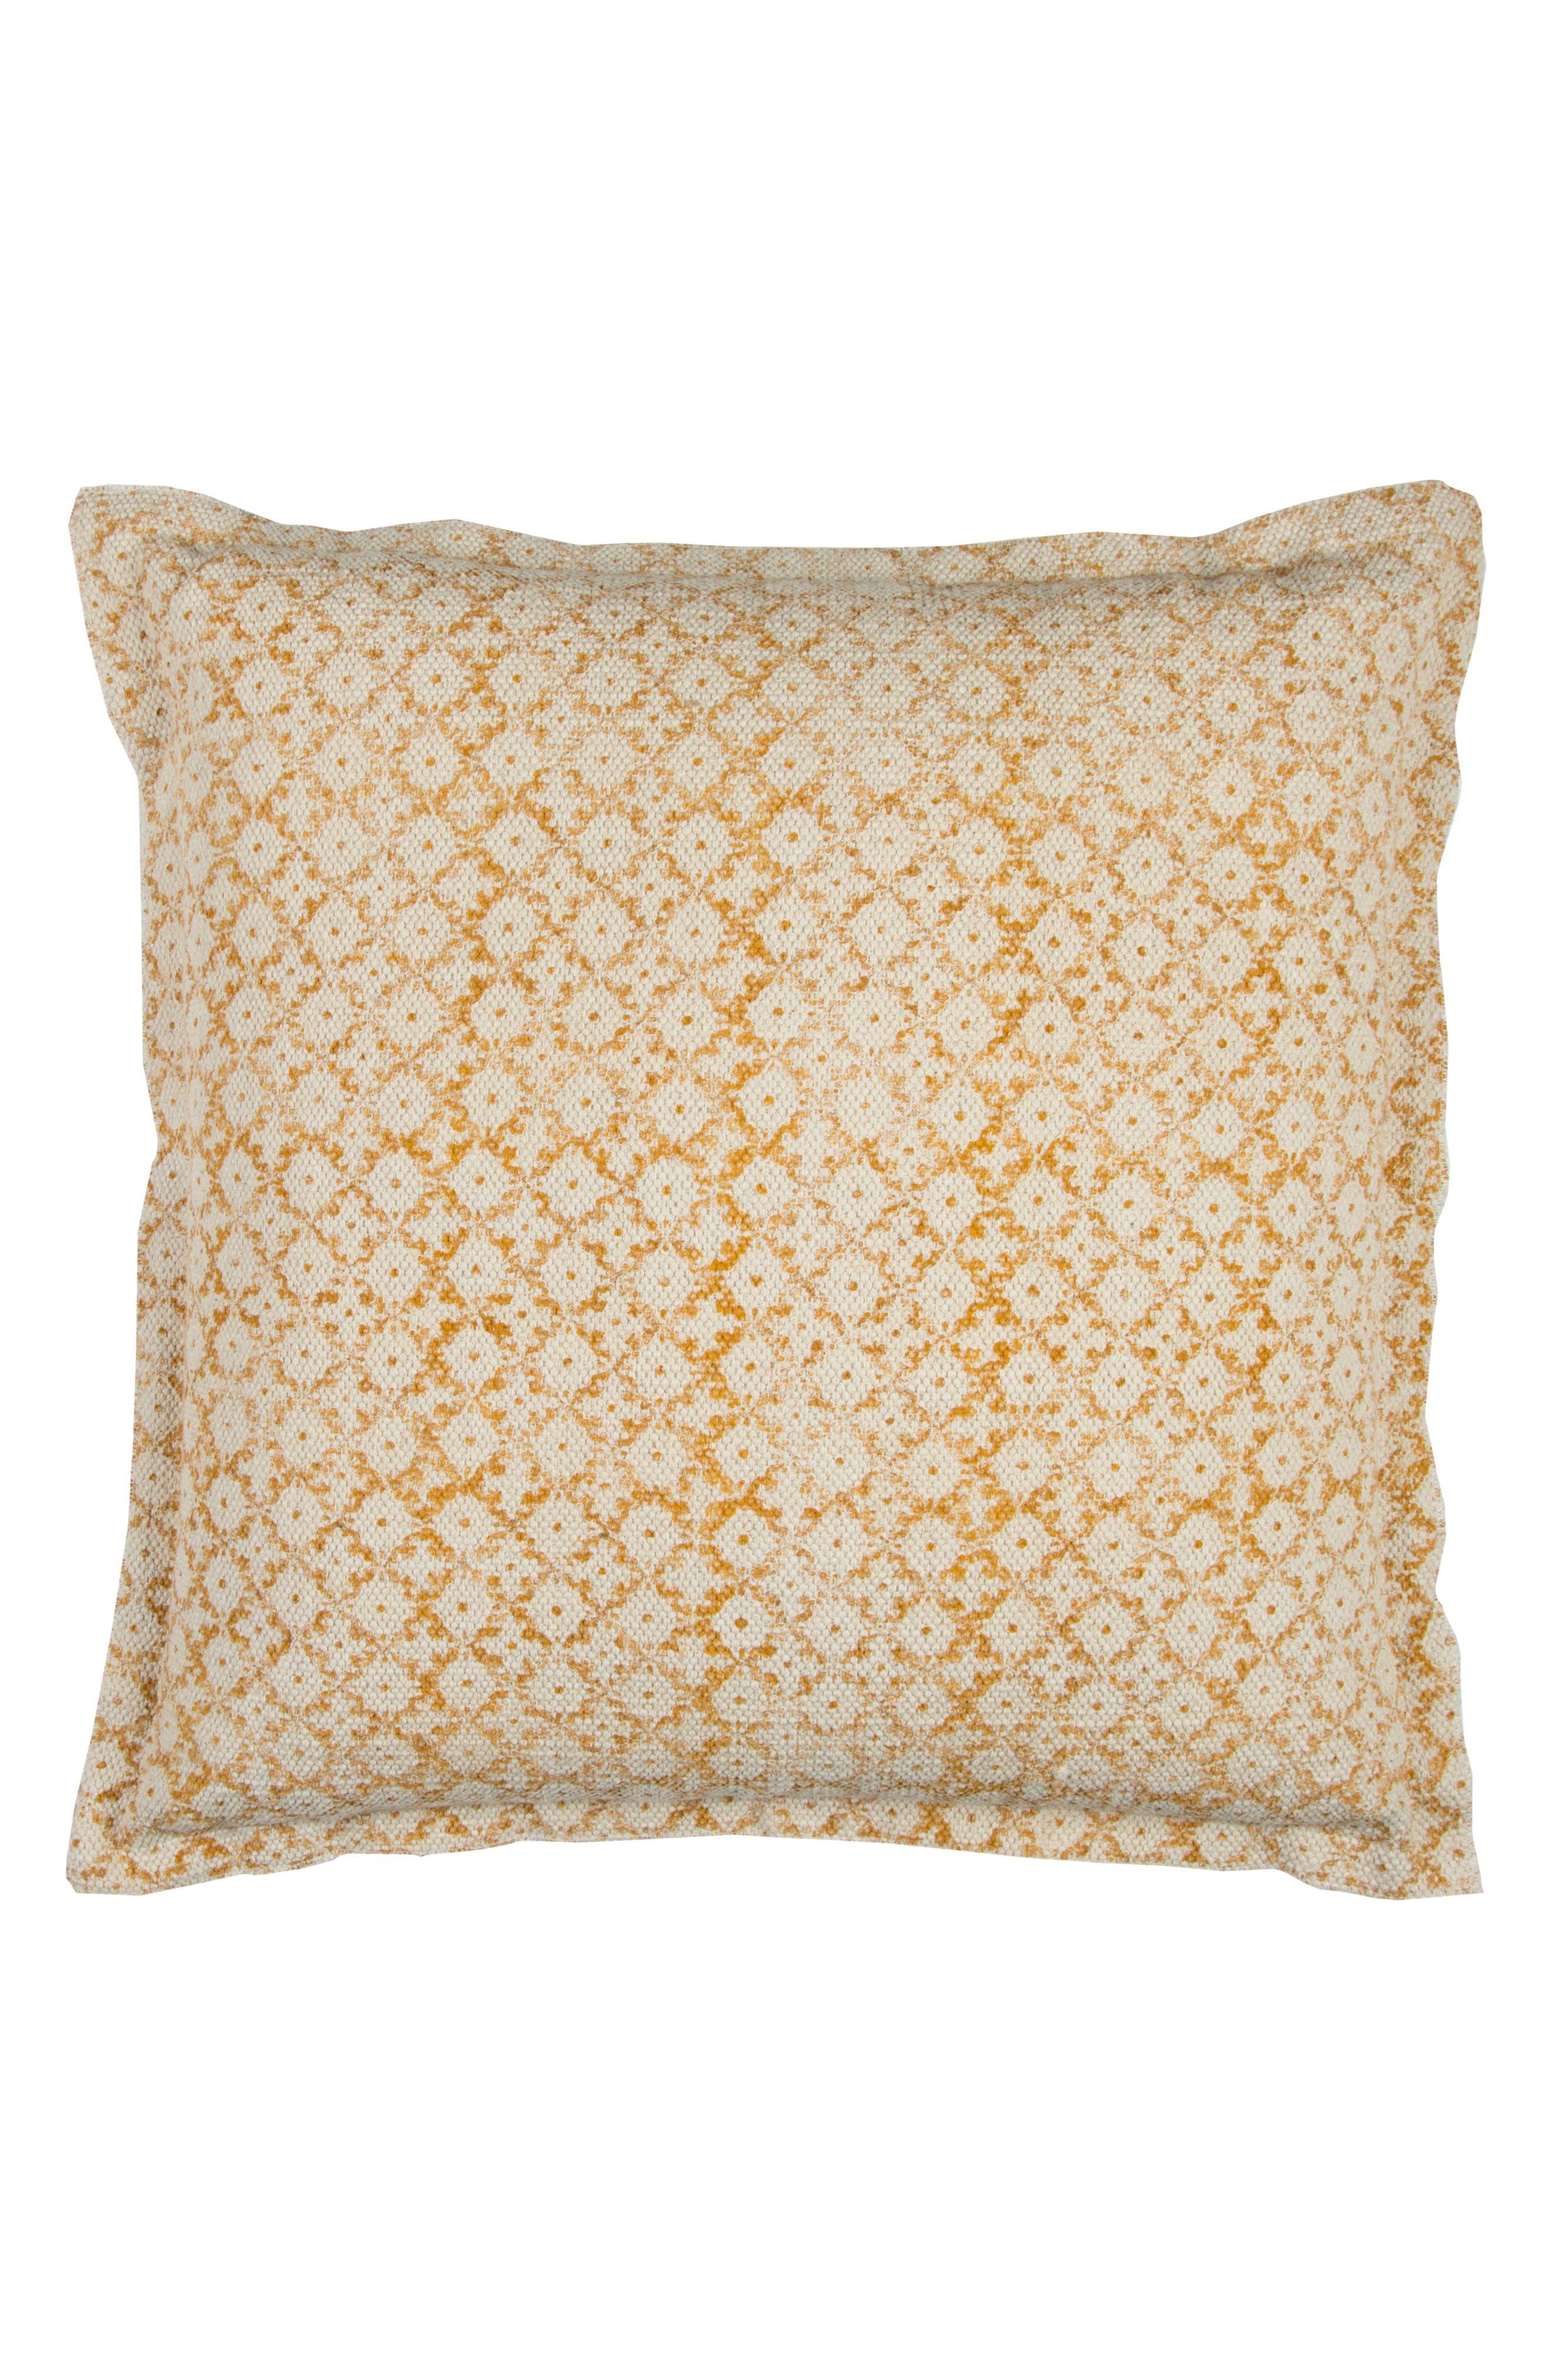 Geometric Accent Pillow,                         Main,                         color, Natural